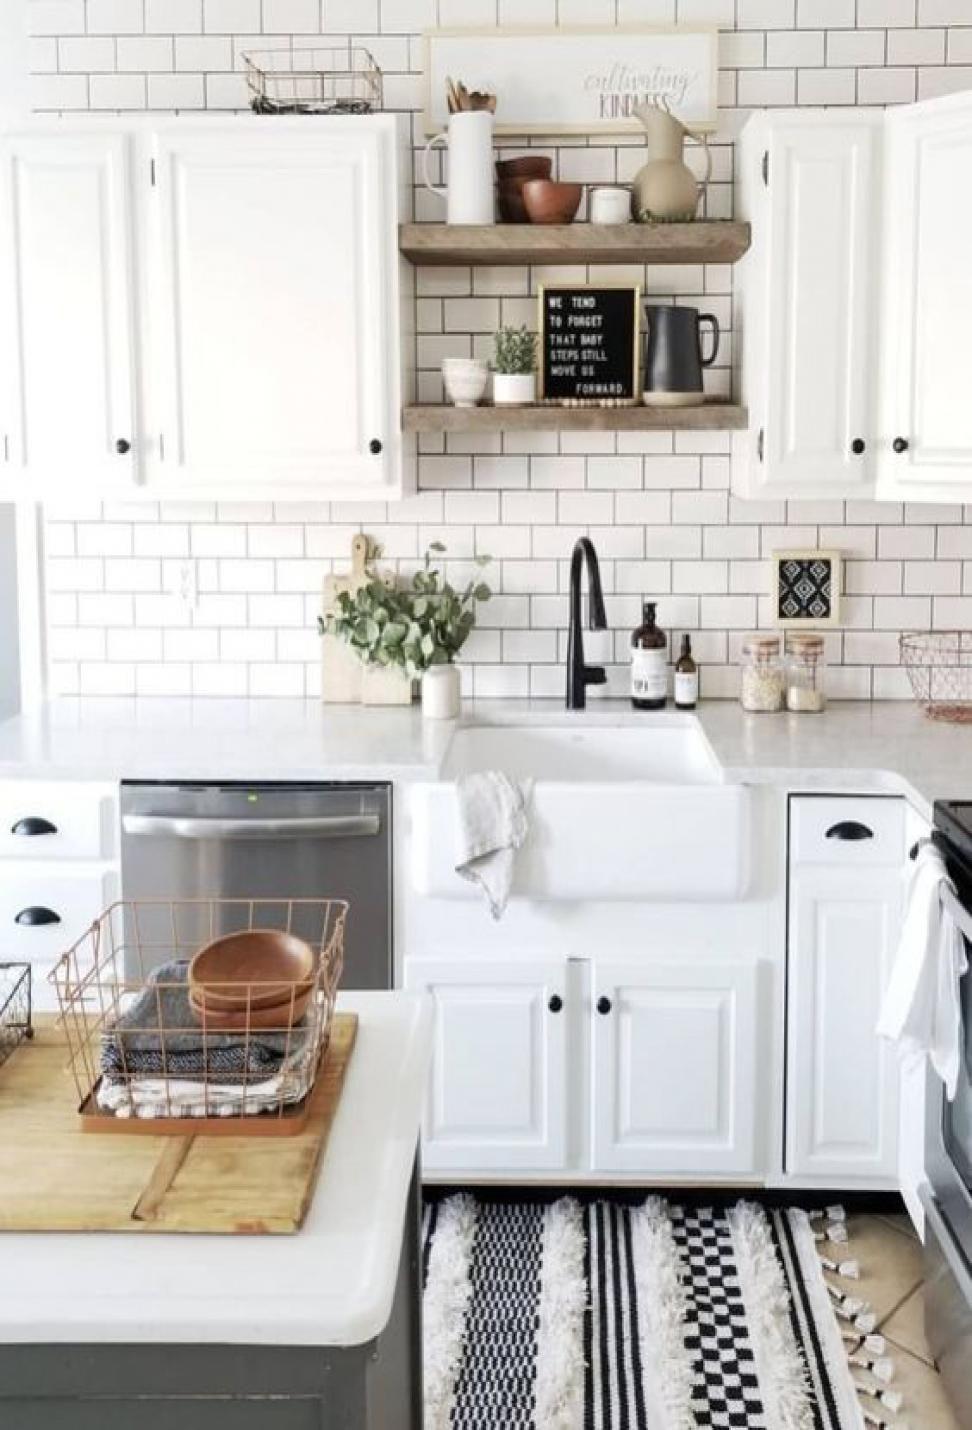 48 Best Ideas For Kitchen Color Design In 2020 Kitchen Tiles Design White Subway Tile Kitchen Kitchen Inspirations